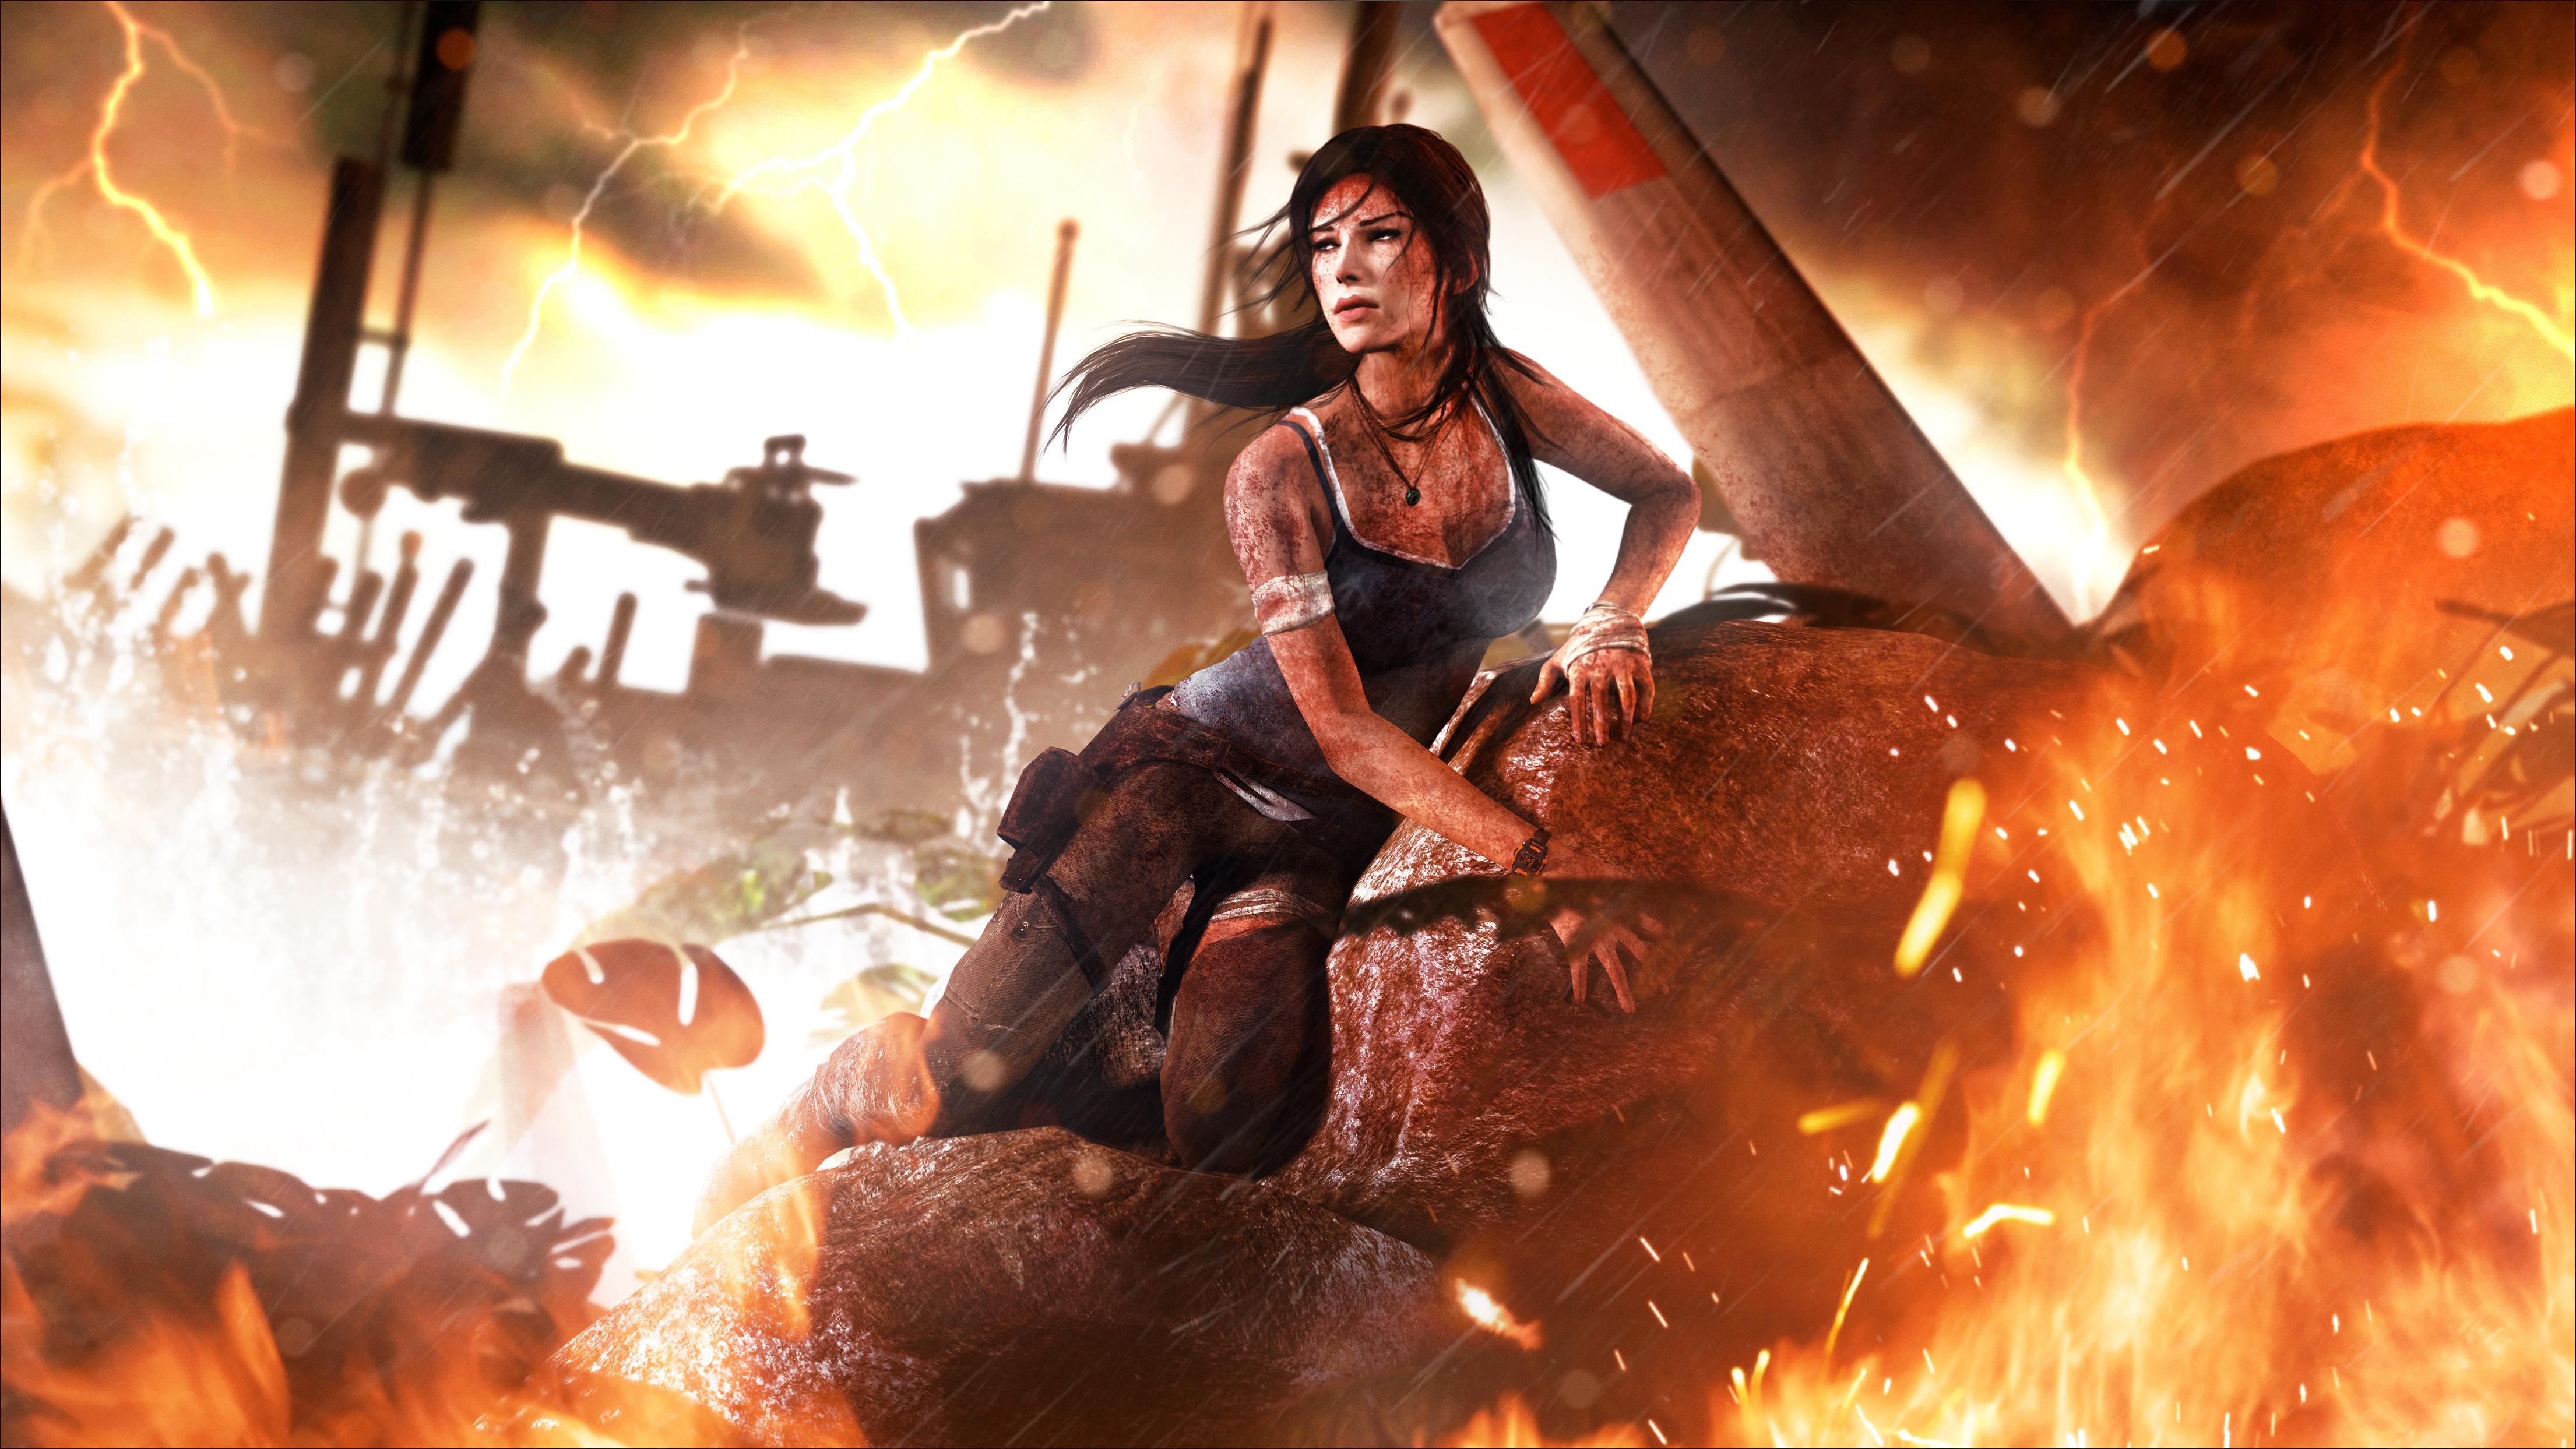 Lara Croft 4K Tomb Raider Wallpaper, HD Games 4K ...